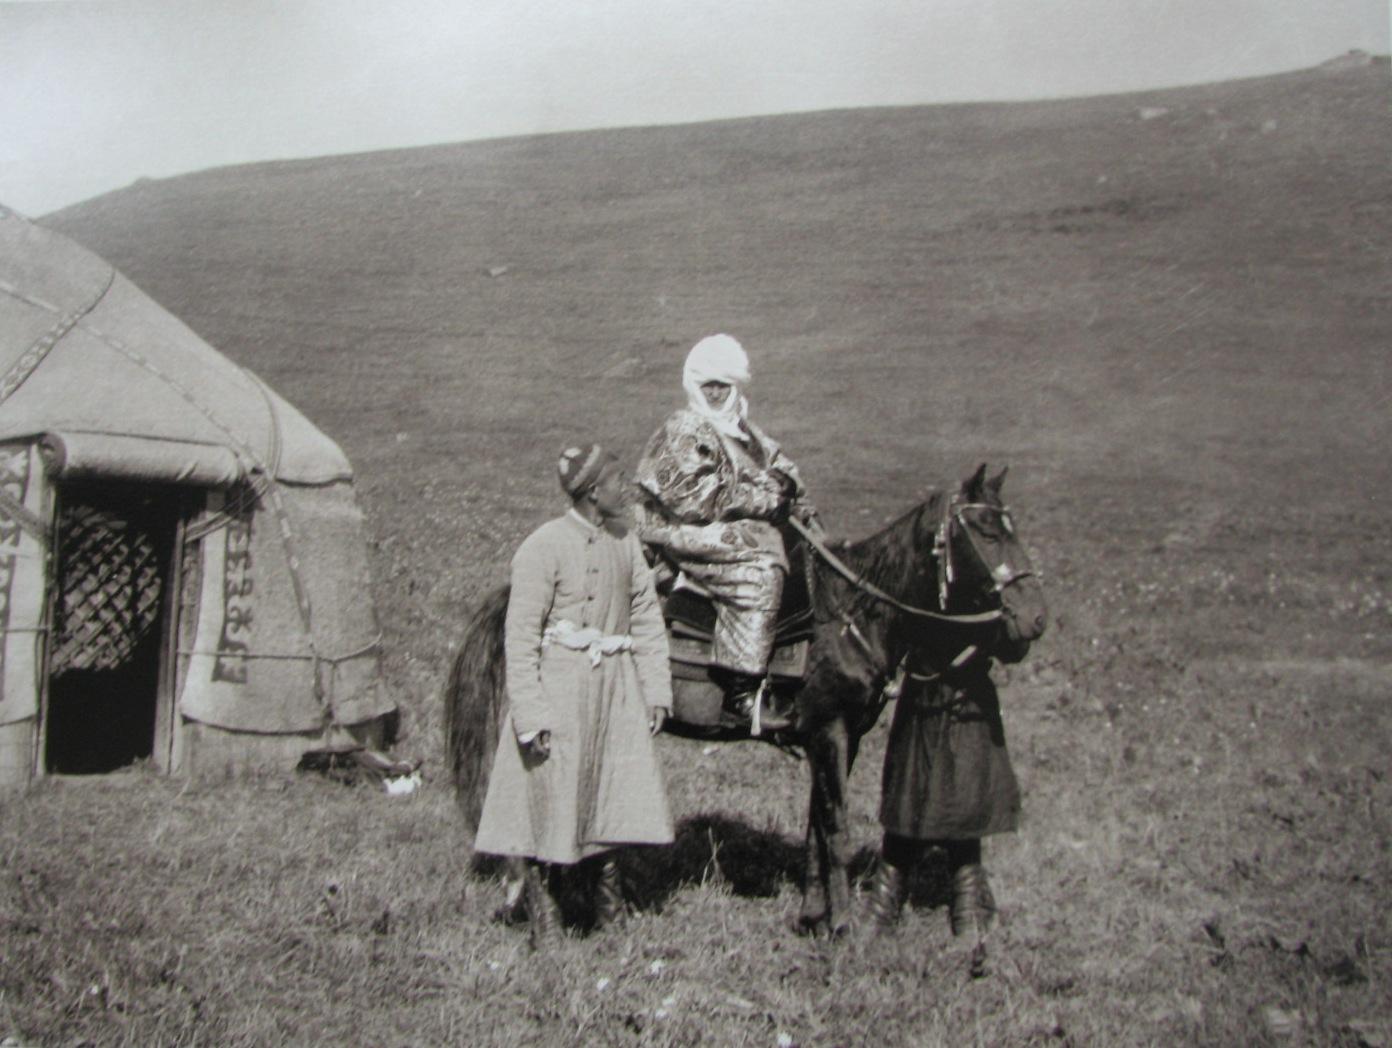 Курманжан датка на коне. Фото: Карл Густав Маннергейм